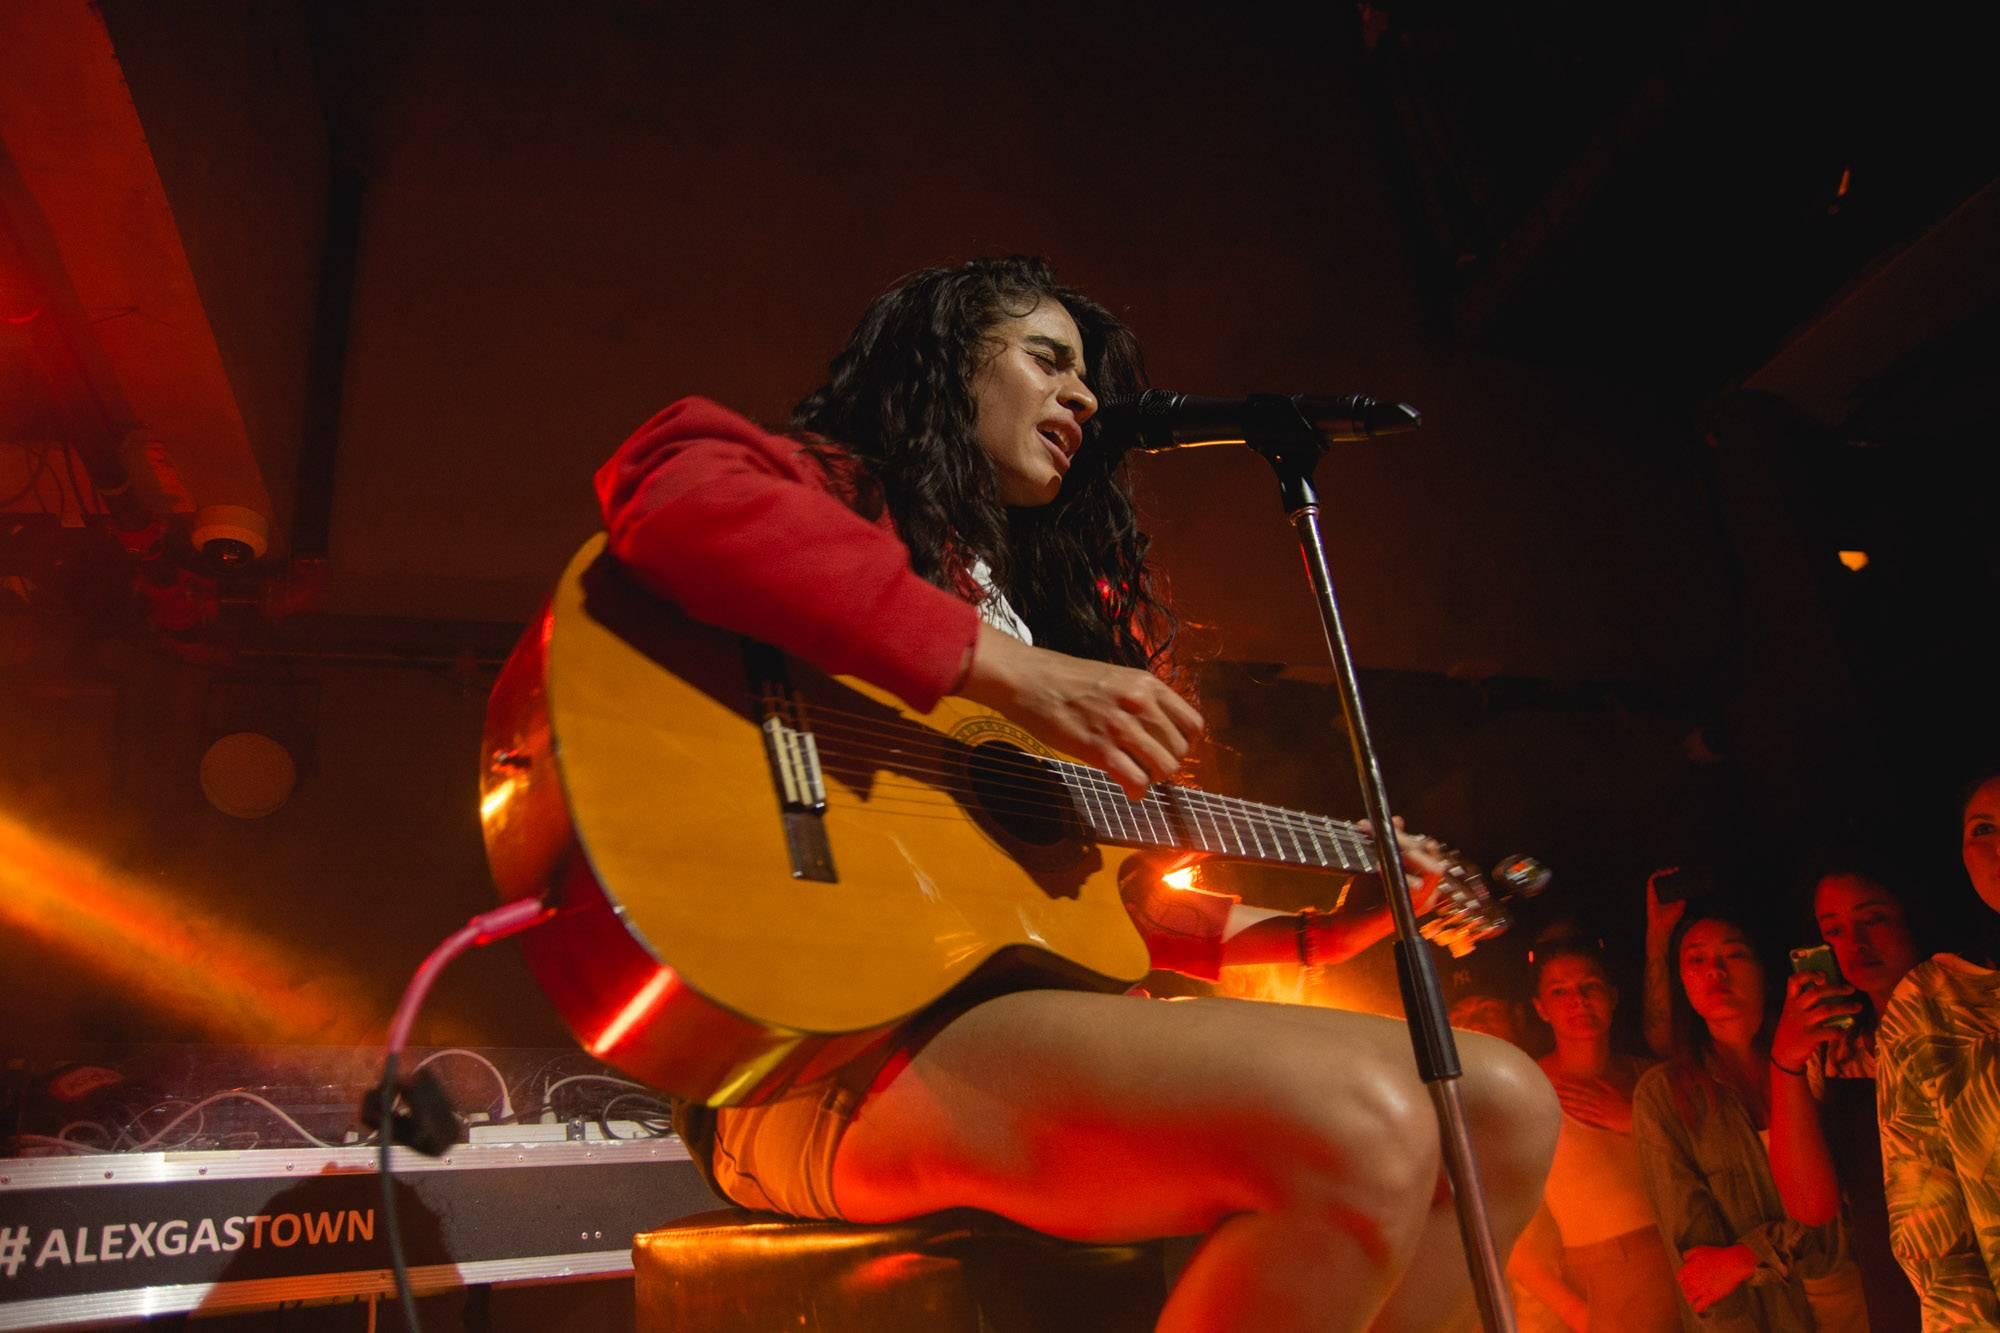 Jessie Reyez at the Alexander, Vancouver, July 2 2017. Audrey Alexandrescu photo.